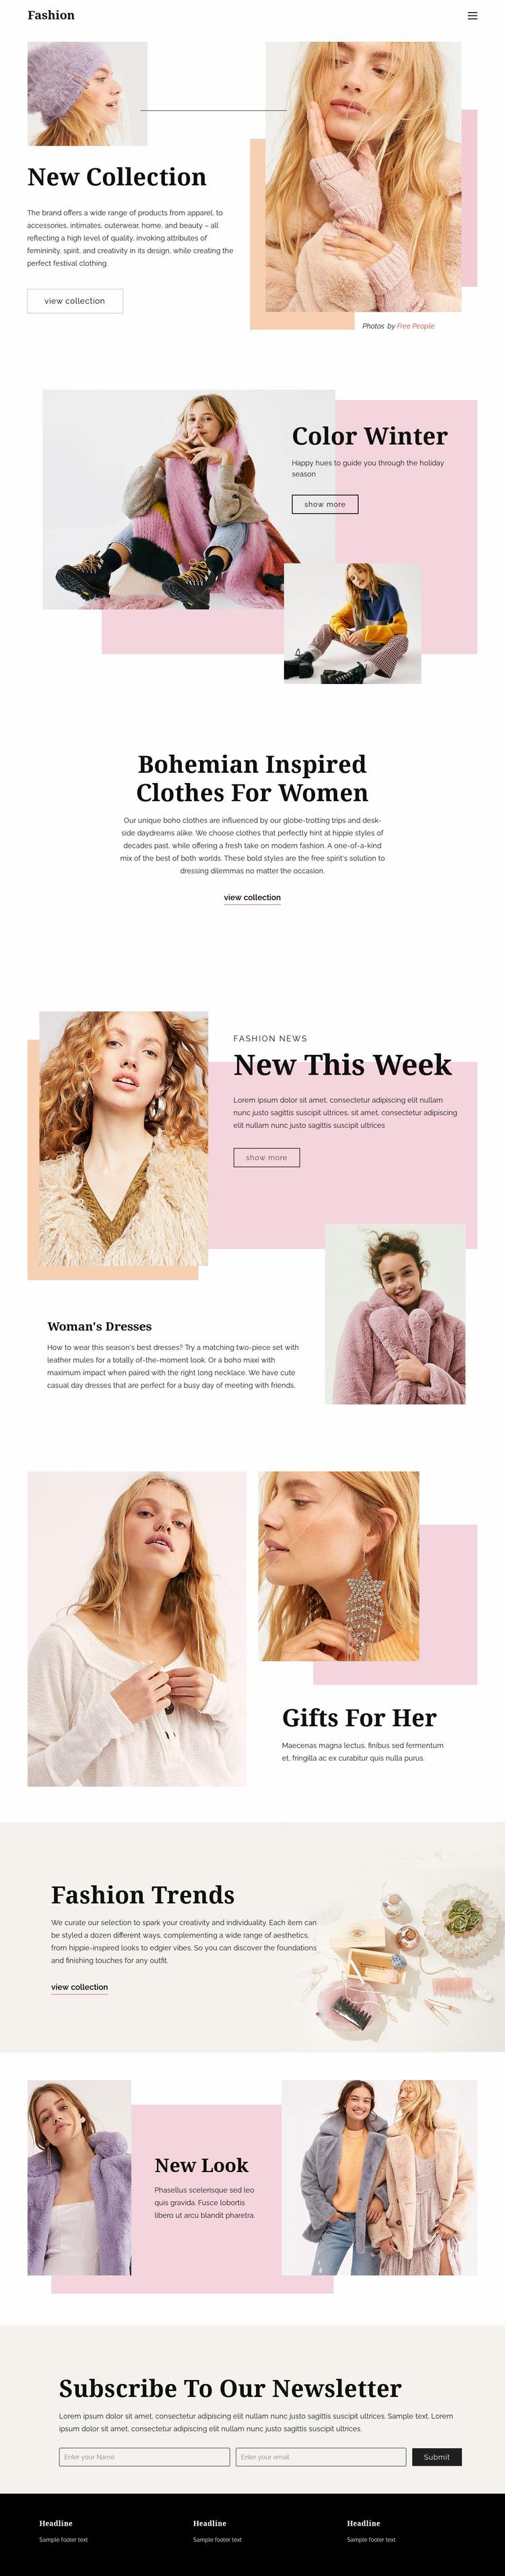 Fashion Page Design Web Page Design